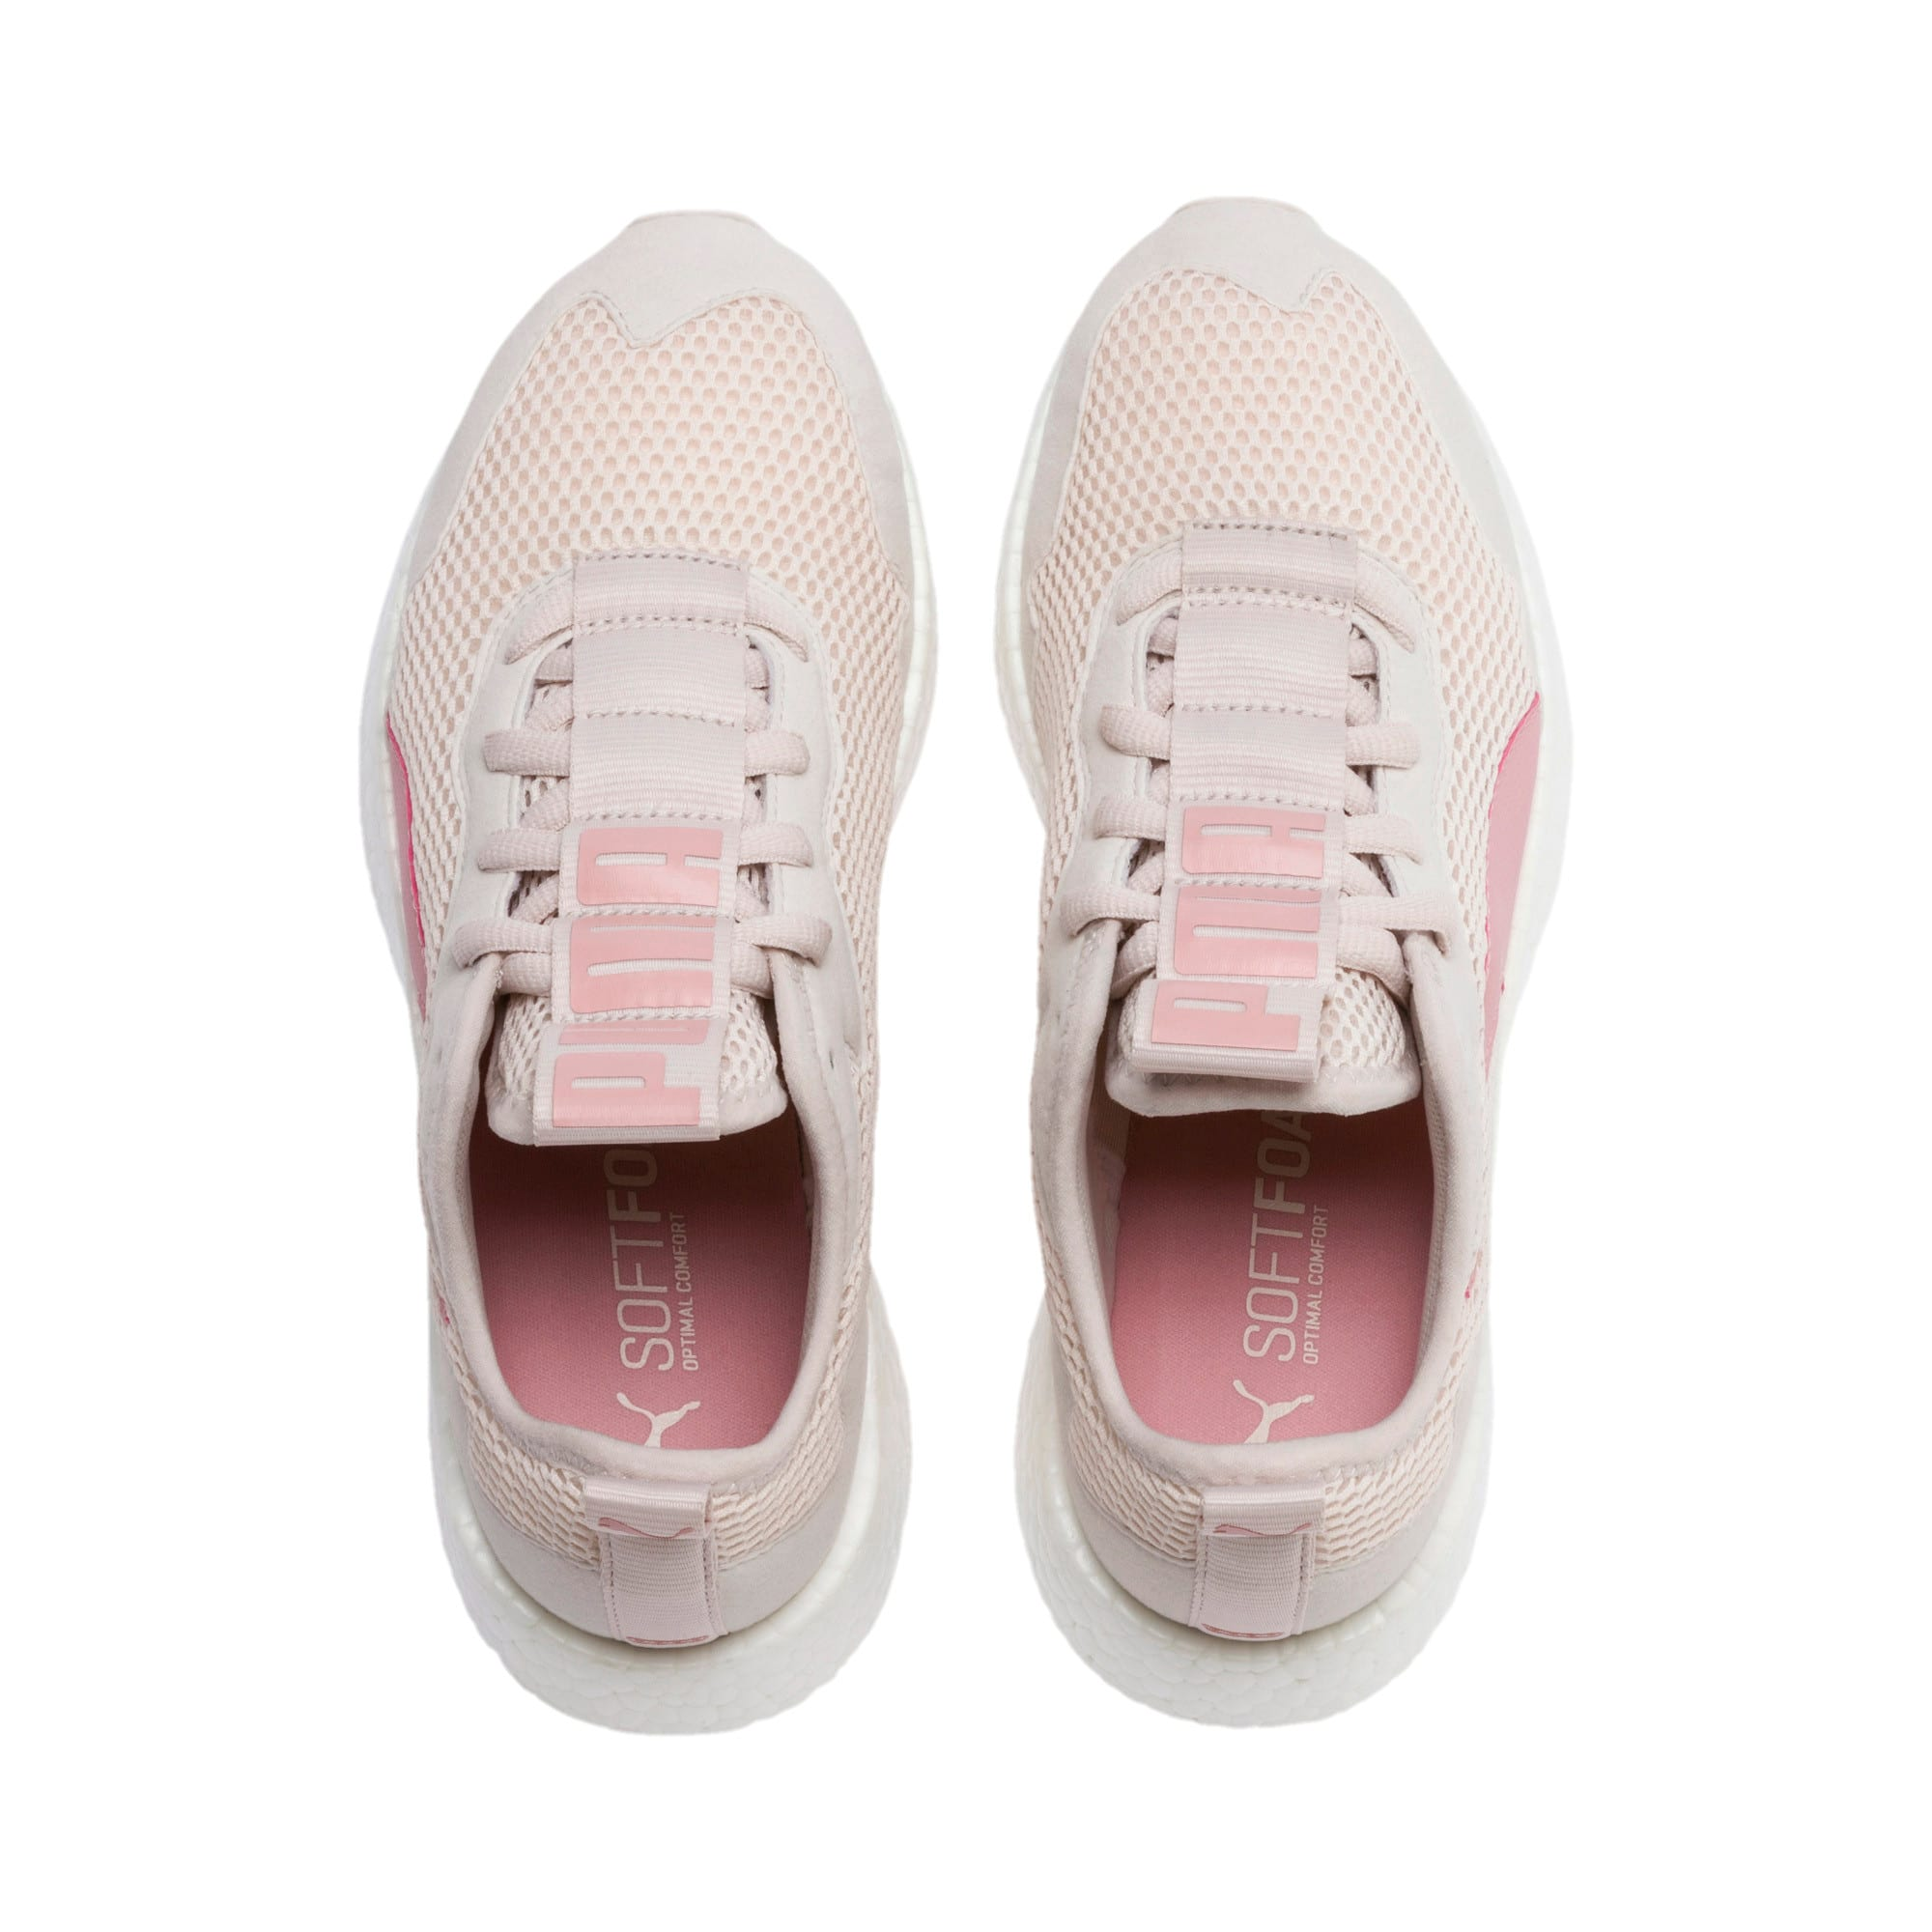 Thumbnail 4 of NRGY Neko Skim Women's Running Shoes, Pastel Parchment-Bridal Rose, medium-IND